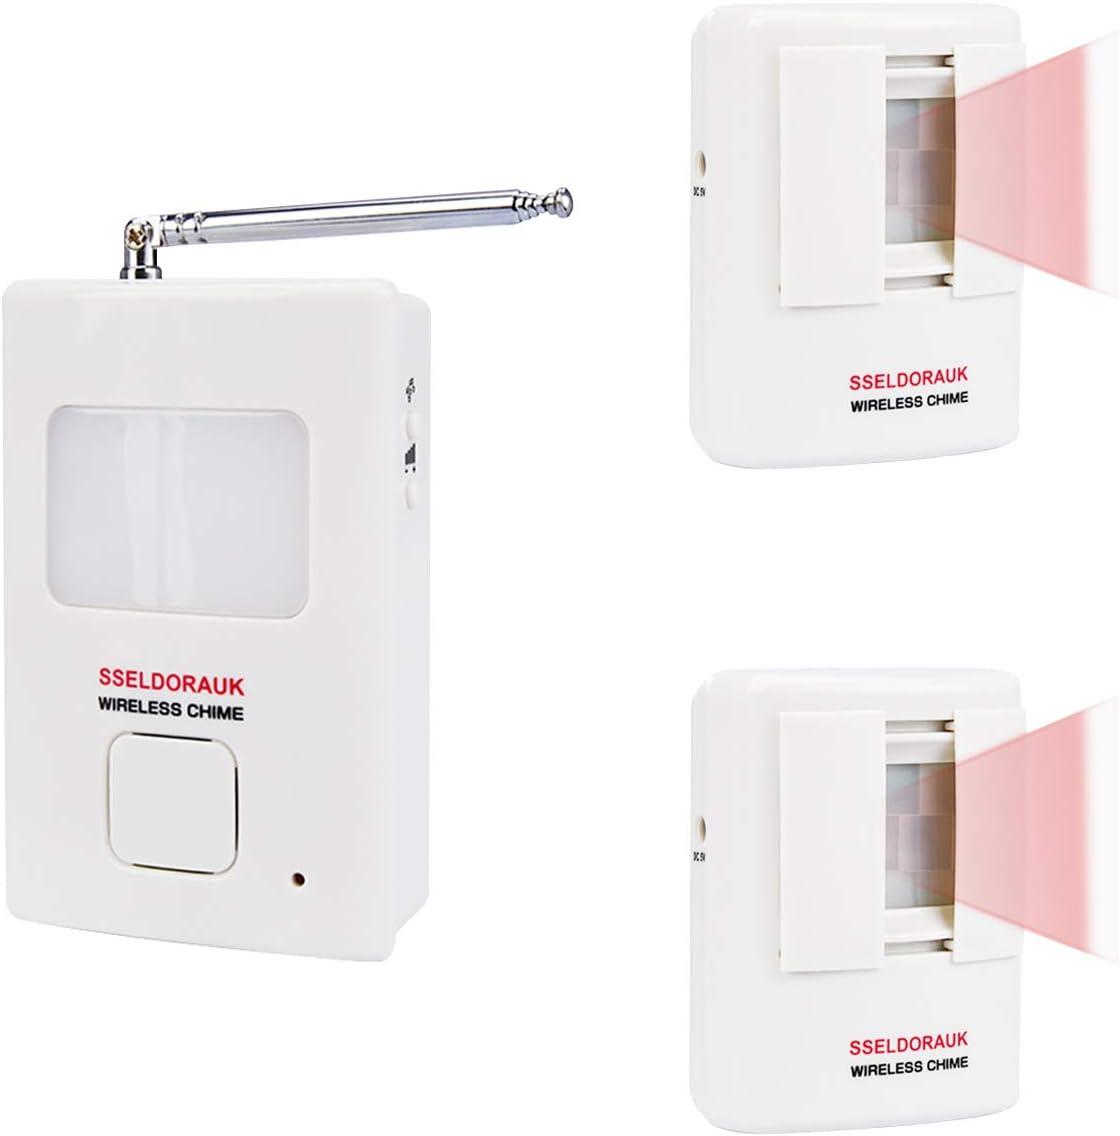 Dog Barking Alarm Motion Detector,Pir Wireless Human Body Walking Sensor Doorbell Door Security Alert System Device for Home or Office Burglar Deterrent (2Sensors + 1Receiver, White)